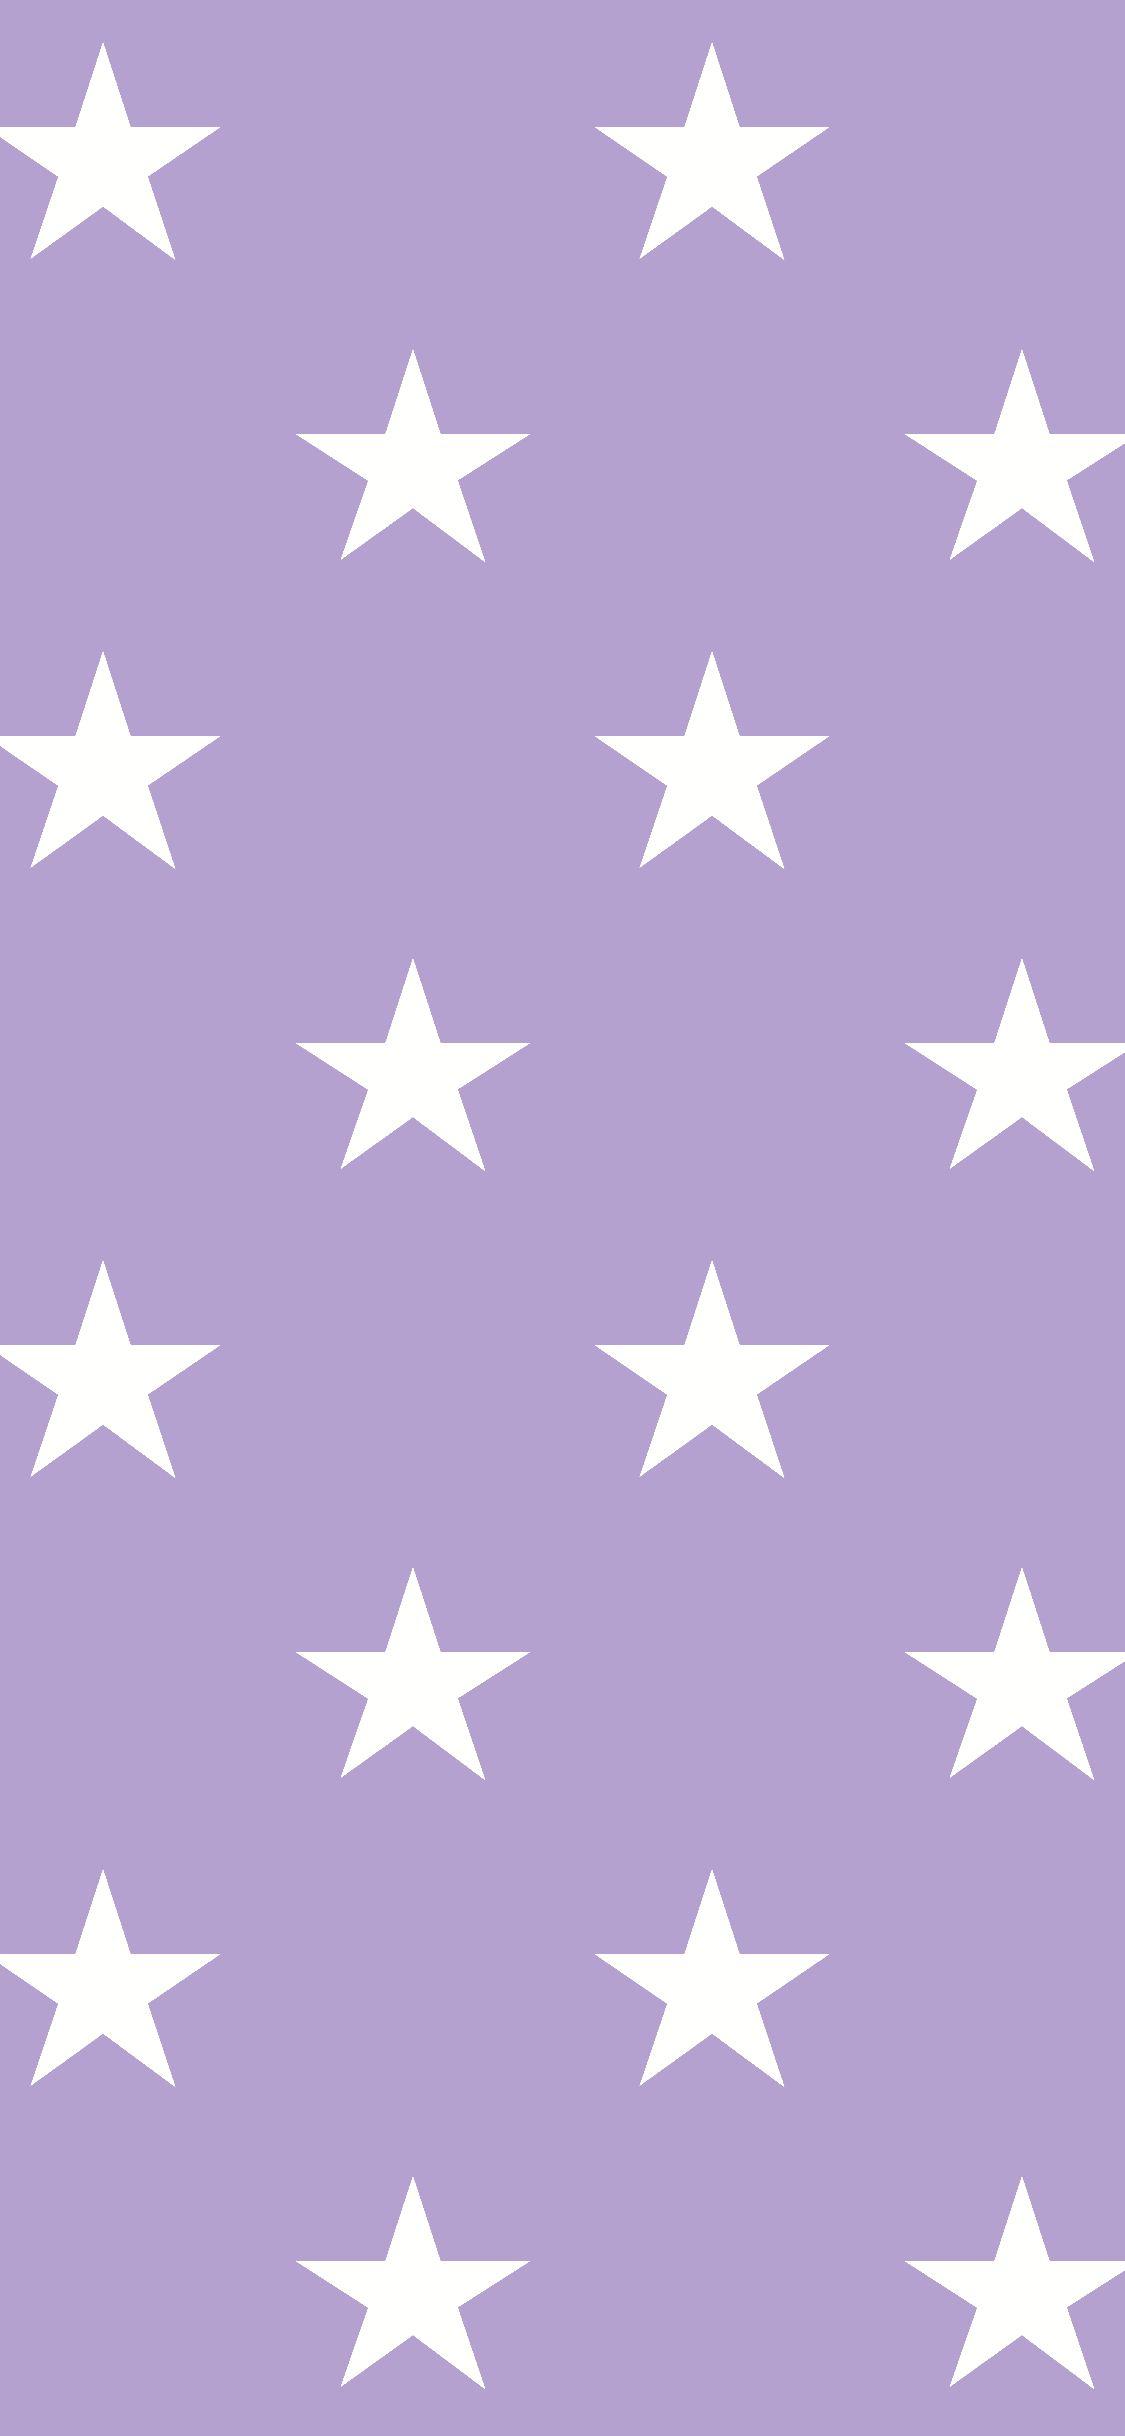 Stars Wallpaper Purple White Light Purple Wallpaper Star Wallpaper Purple Wallpaper Iphone